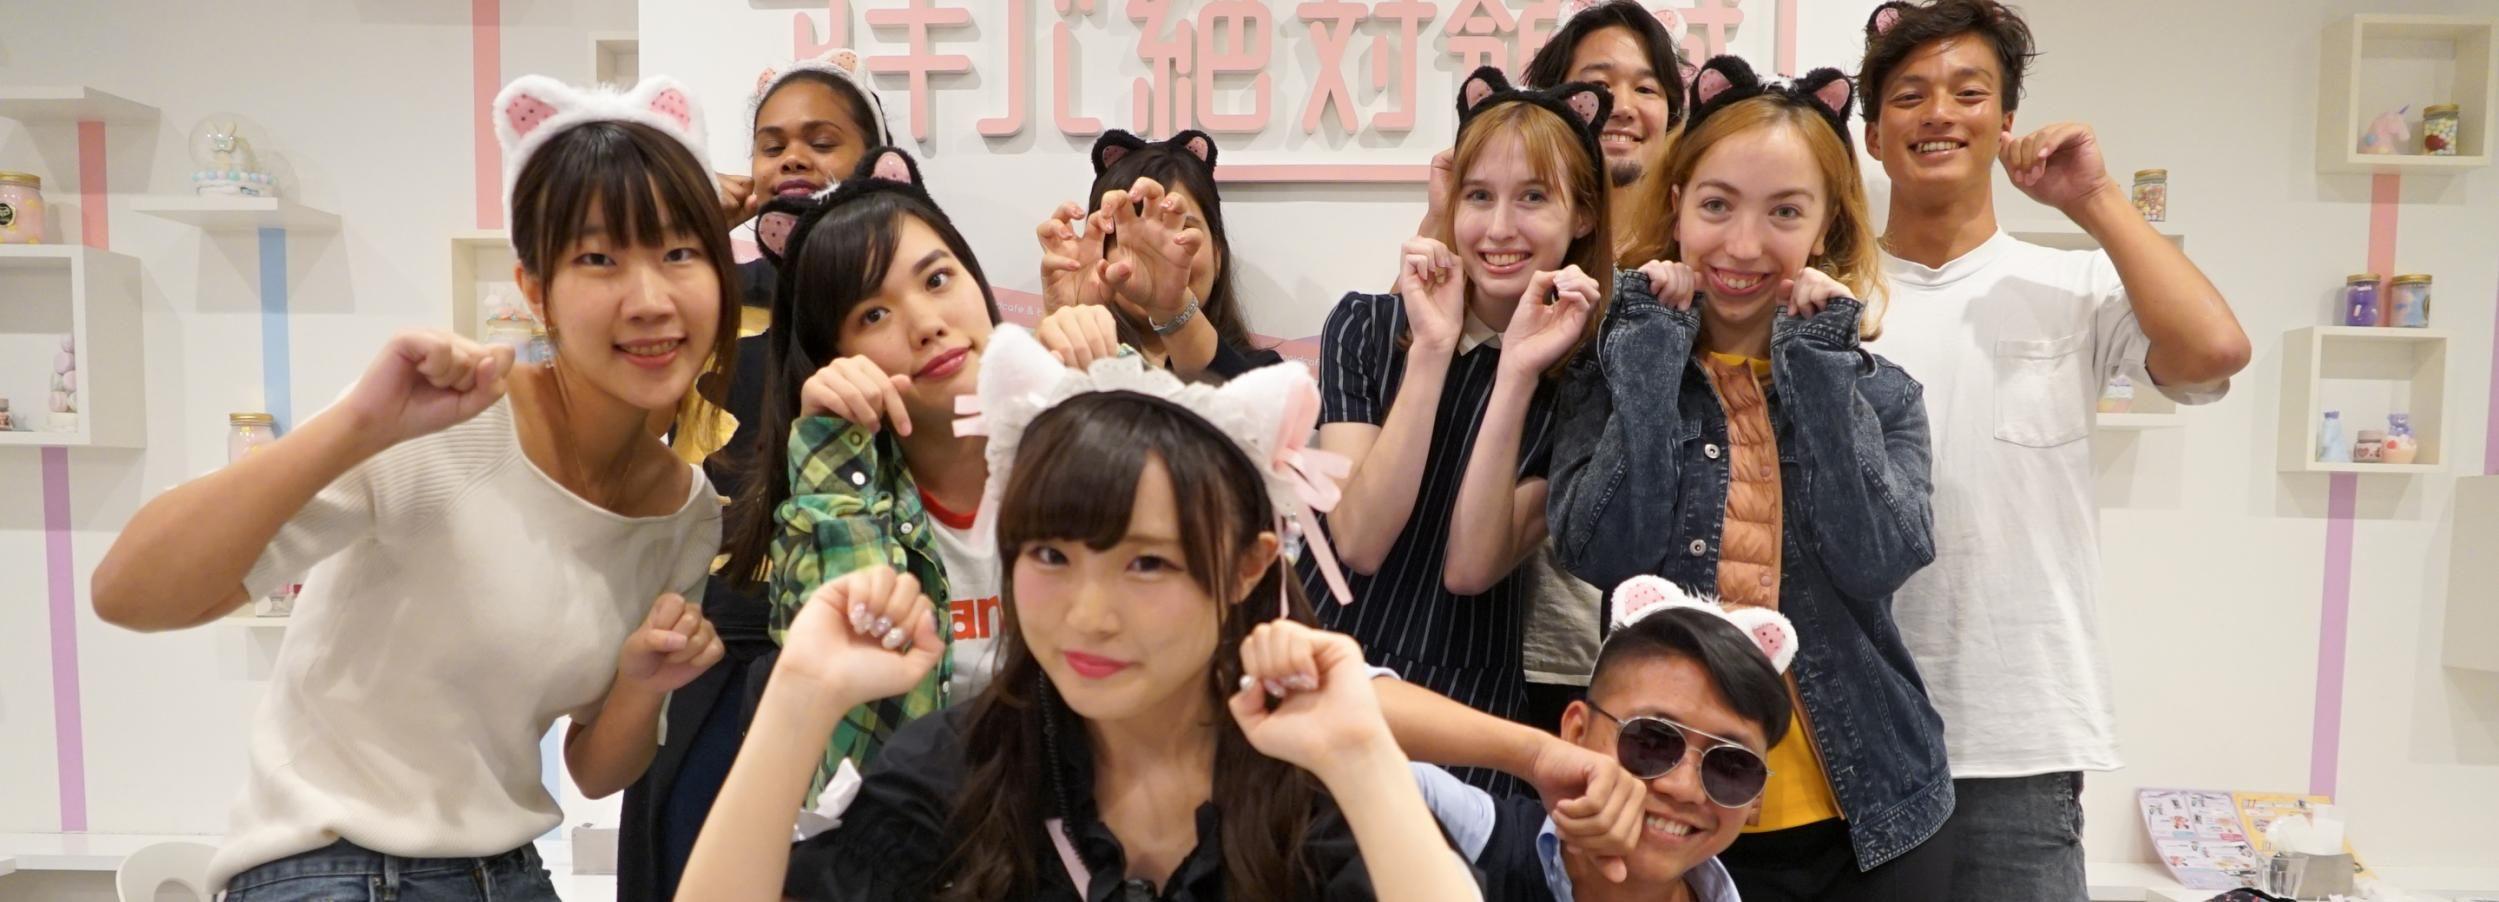 Akihabara: Anime y Gaming Adventure Tour